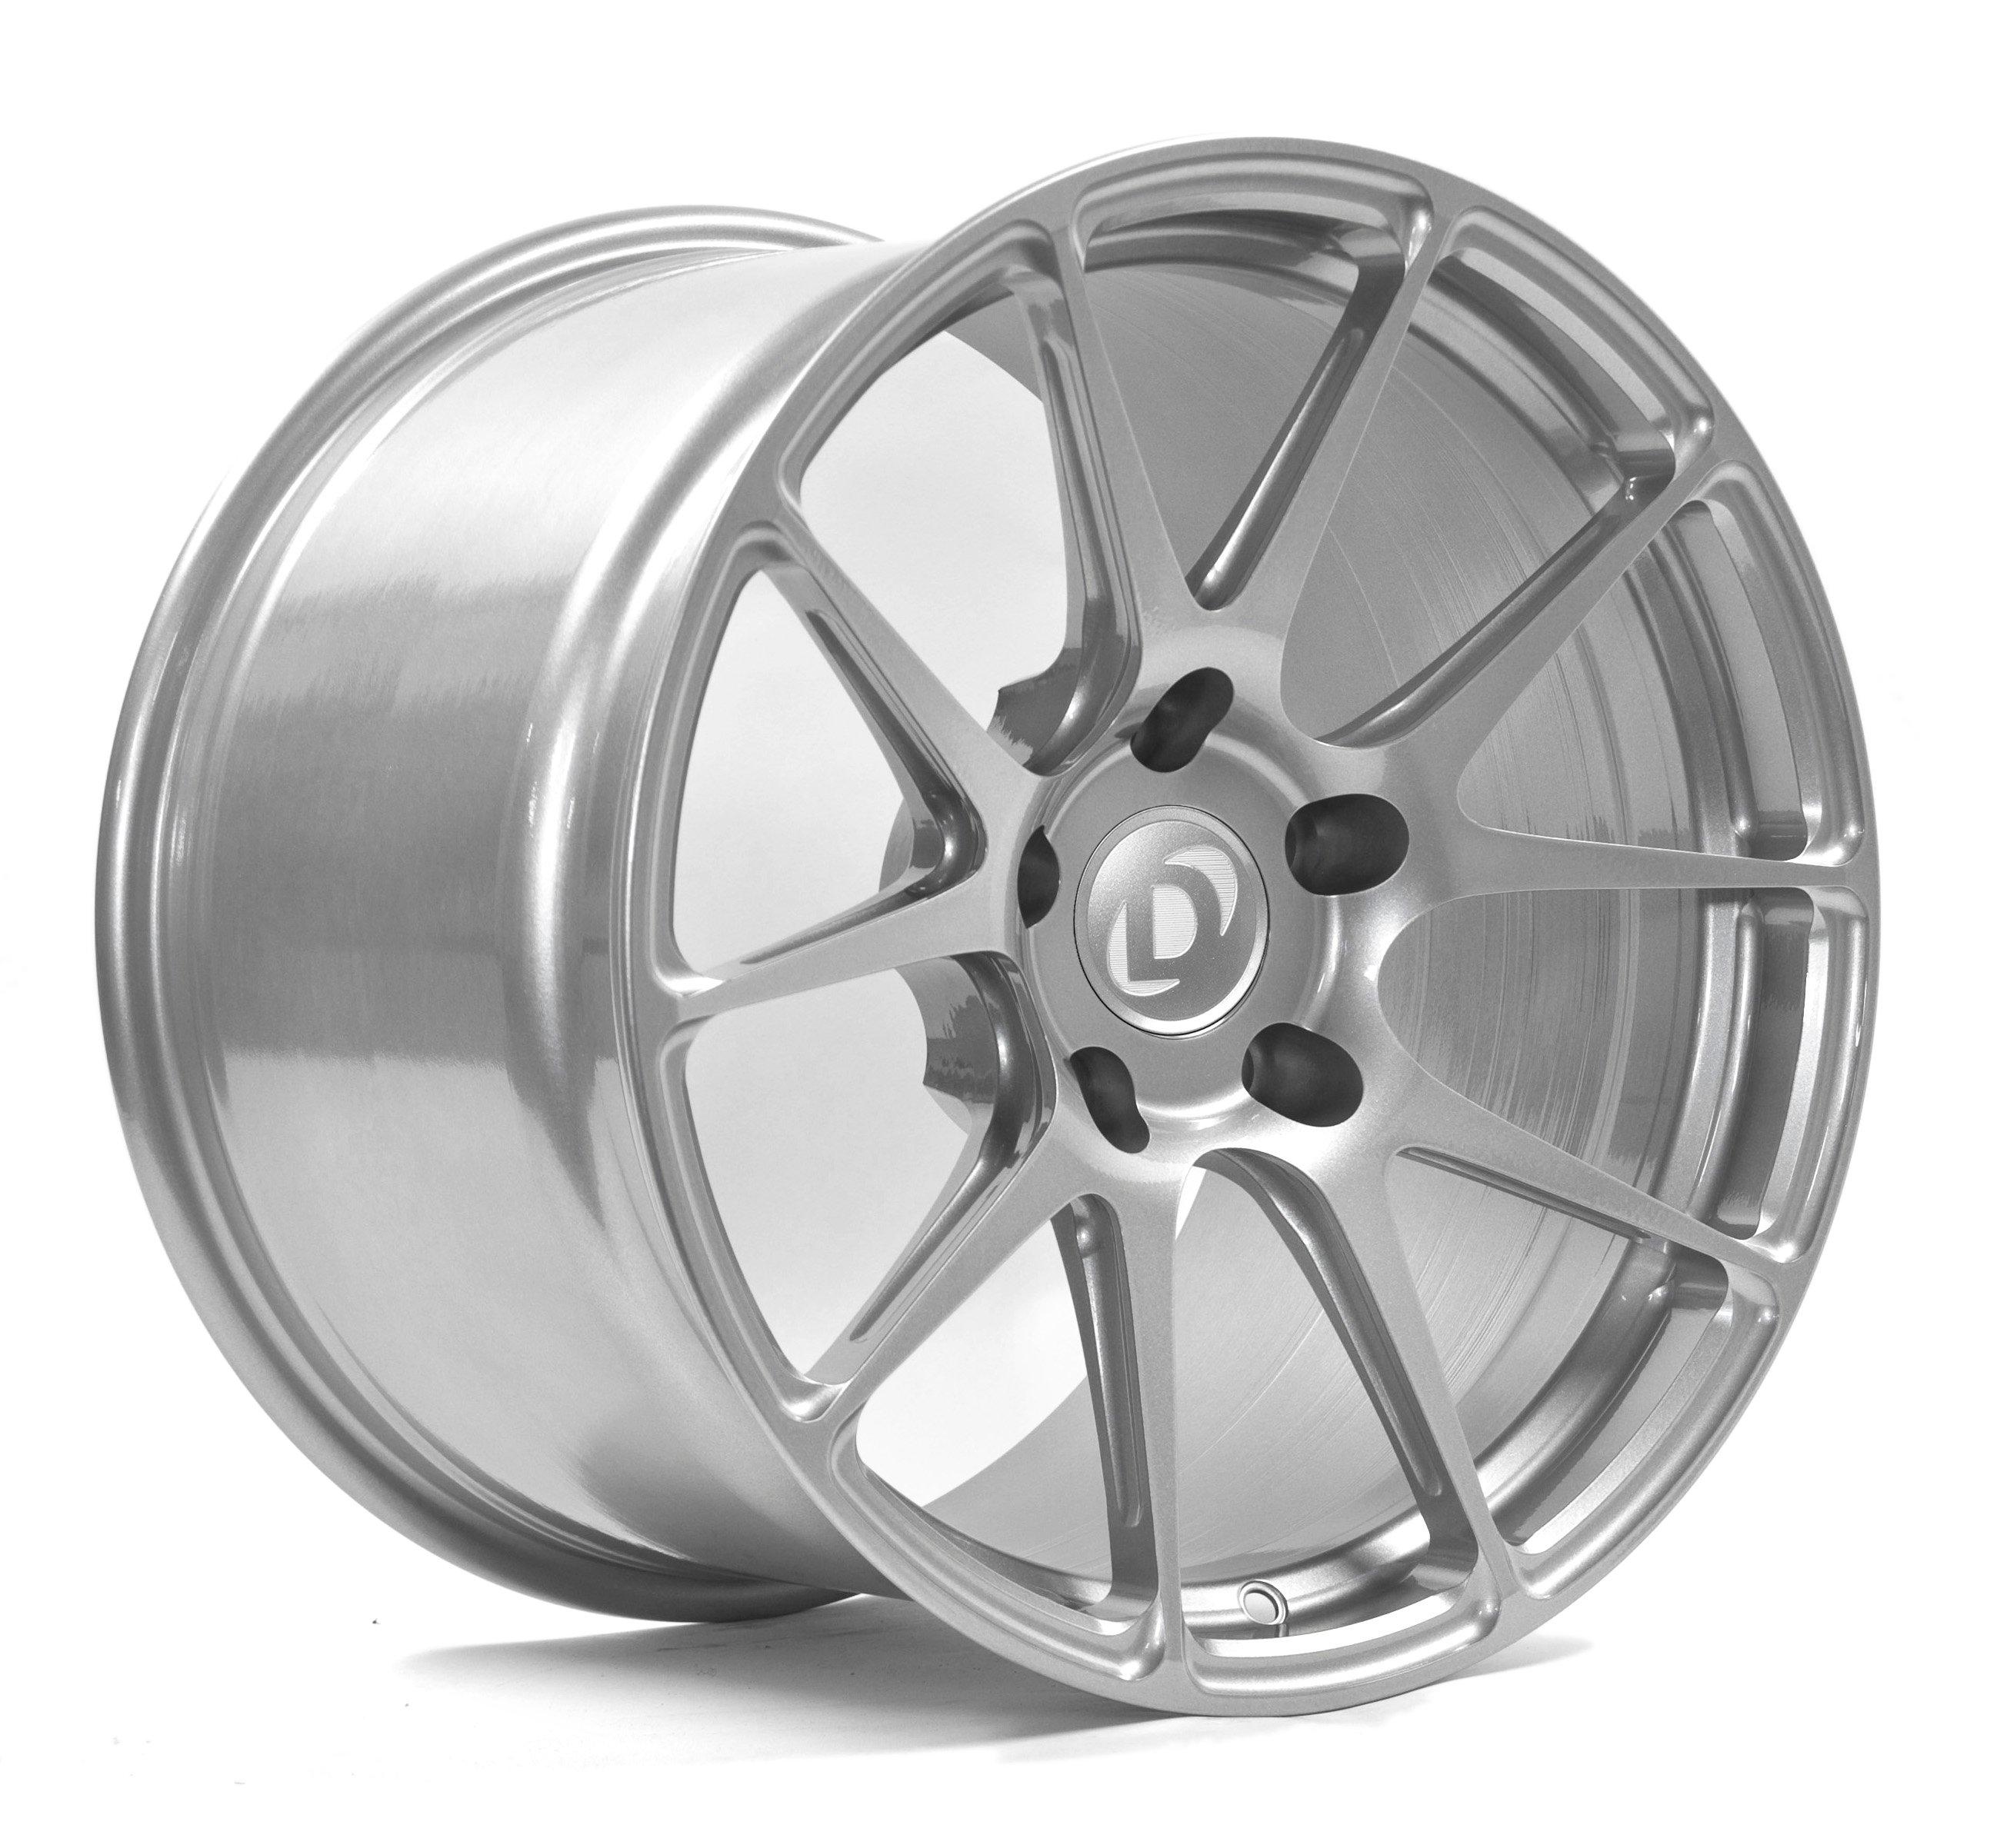 Dinan D750-0087-GA1R-SIL Forgeline GA1R Performance Wheel